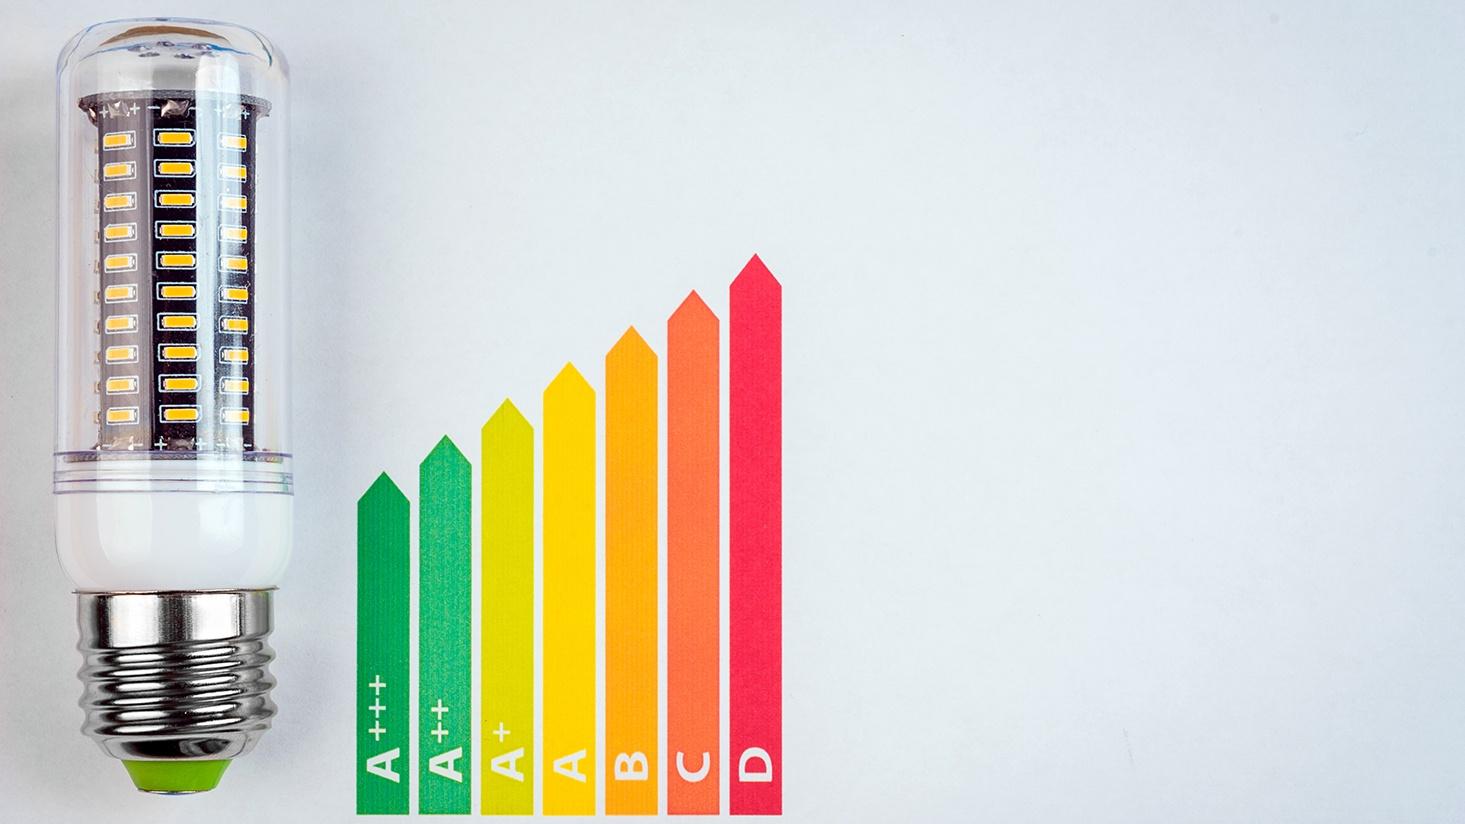 Here are some lumen per watt (LPW) targets for common LEDs